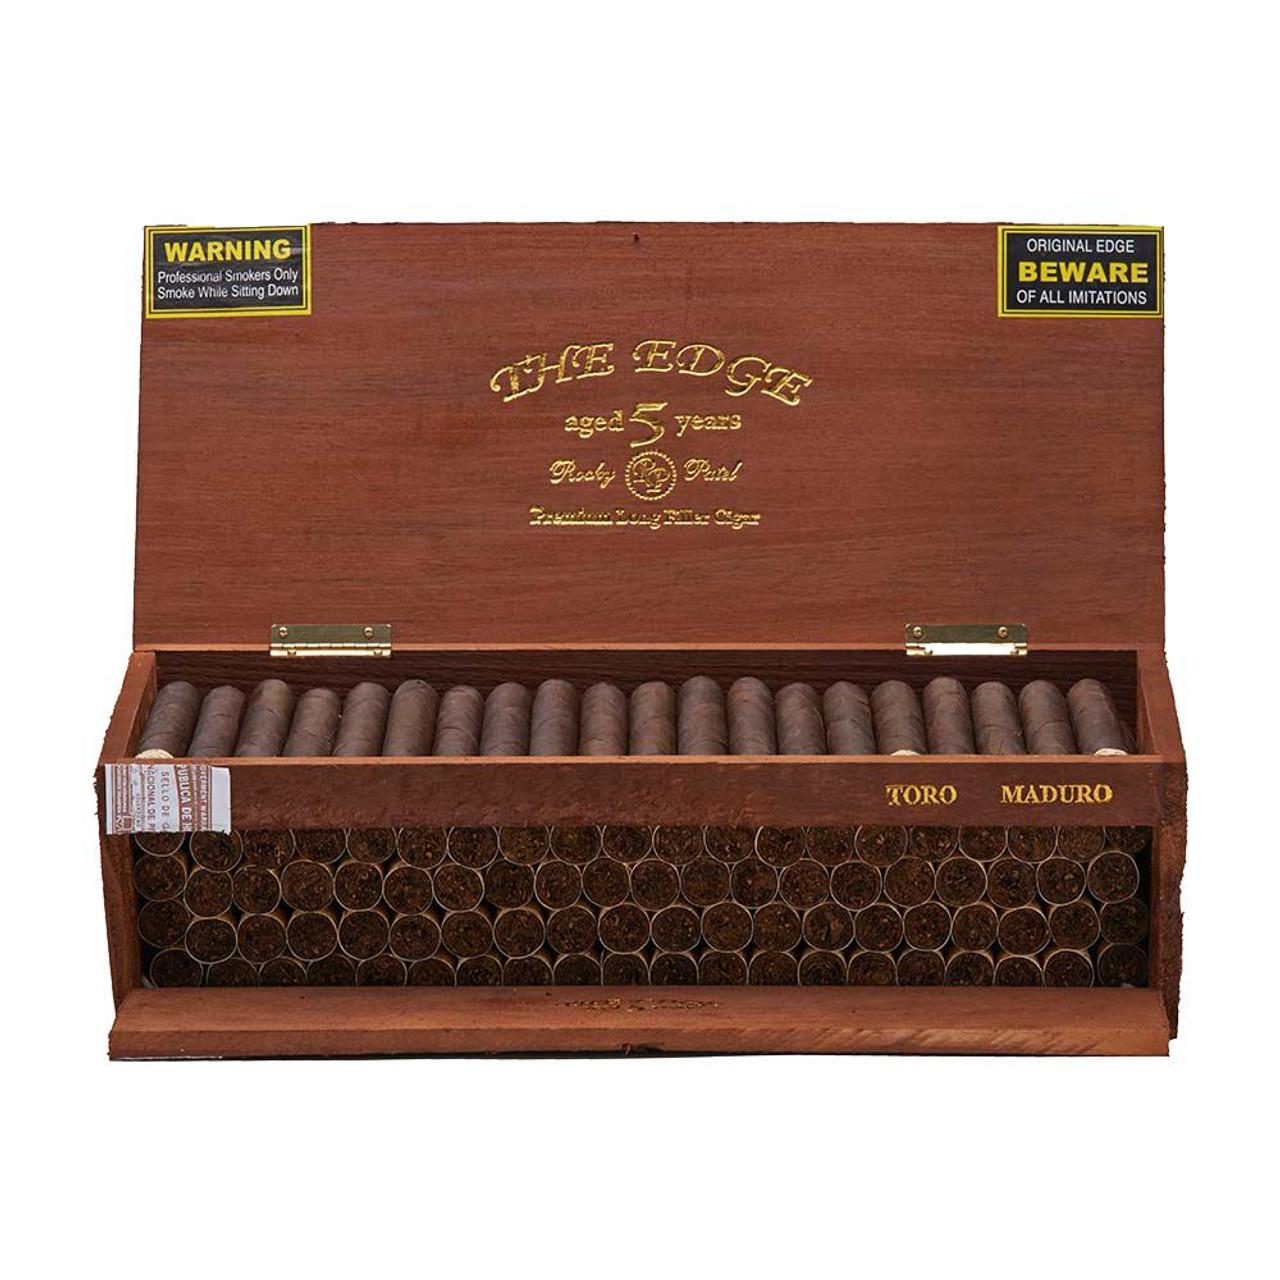 Rocky Patel The Edge Maduro Toro Tray Cigars - 6 x 52 (Box of 100)